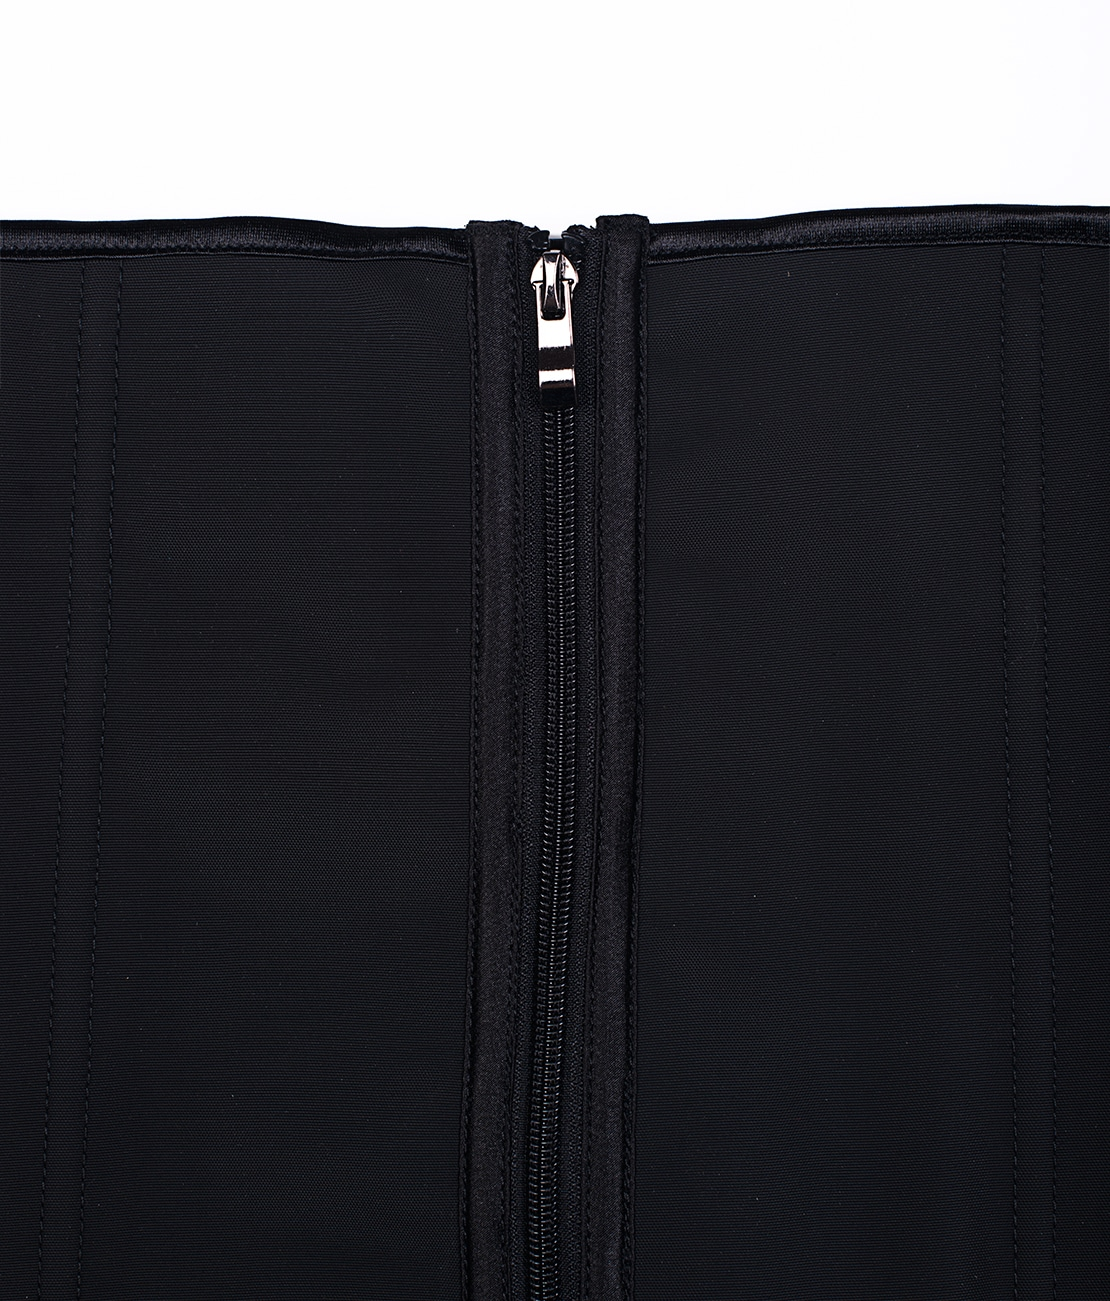 Gaine Minceur Packshot Detail 1